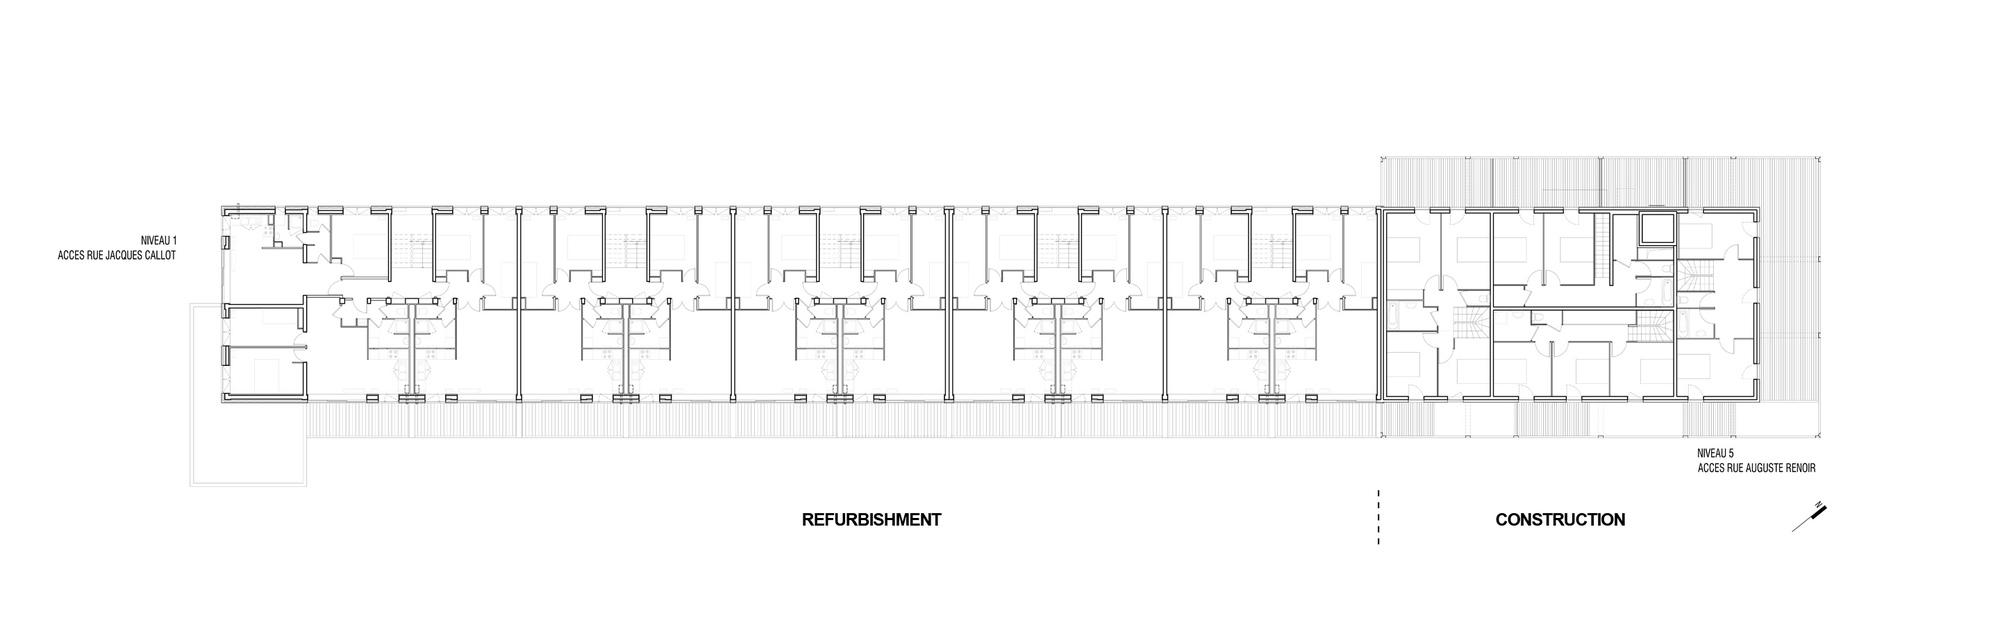 gallery of callot b1 housing jacques boucheton architectes 12. Black Bedroom Furniture Sets. Home Design Ideas